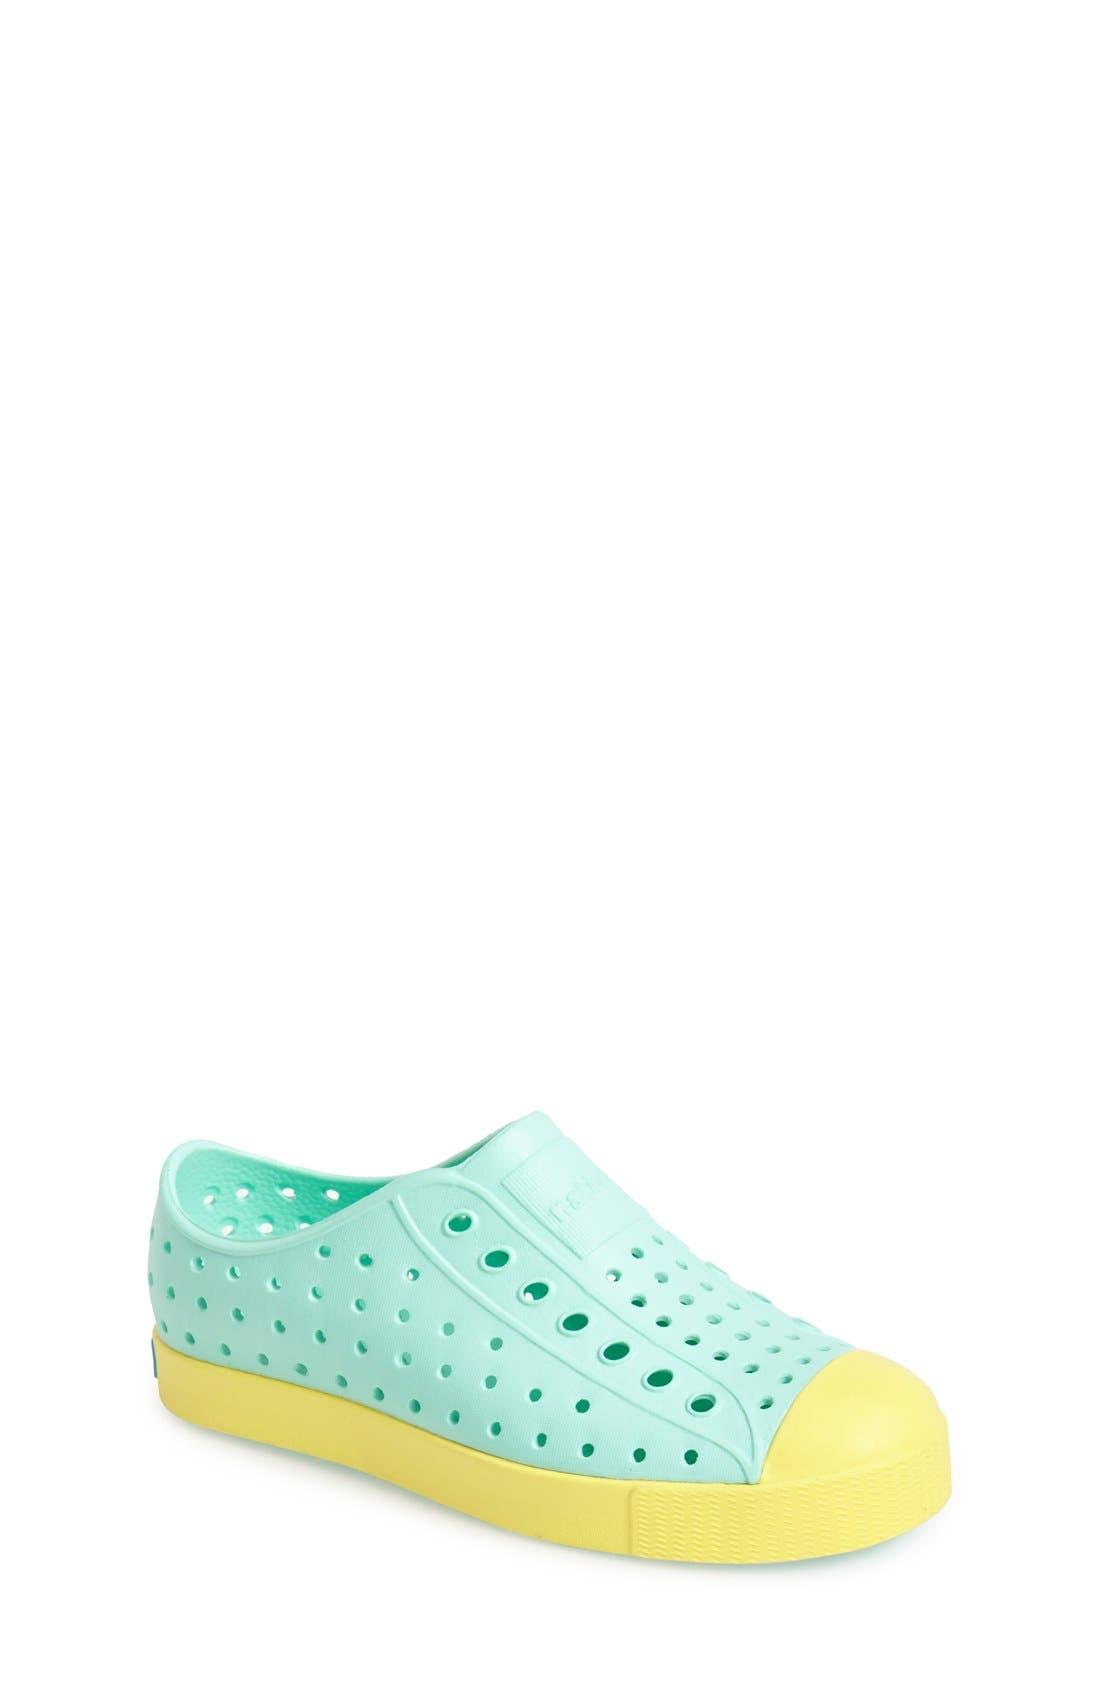 'Jefferson' Water Friendly Slip-On Sneaker,                             Main thumbnail 41, color,